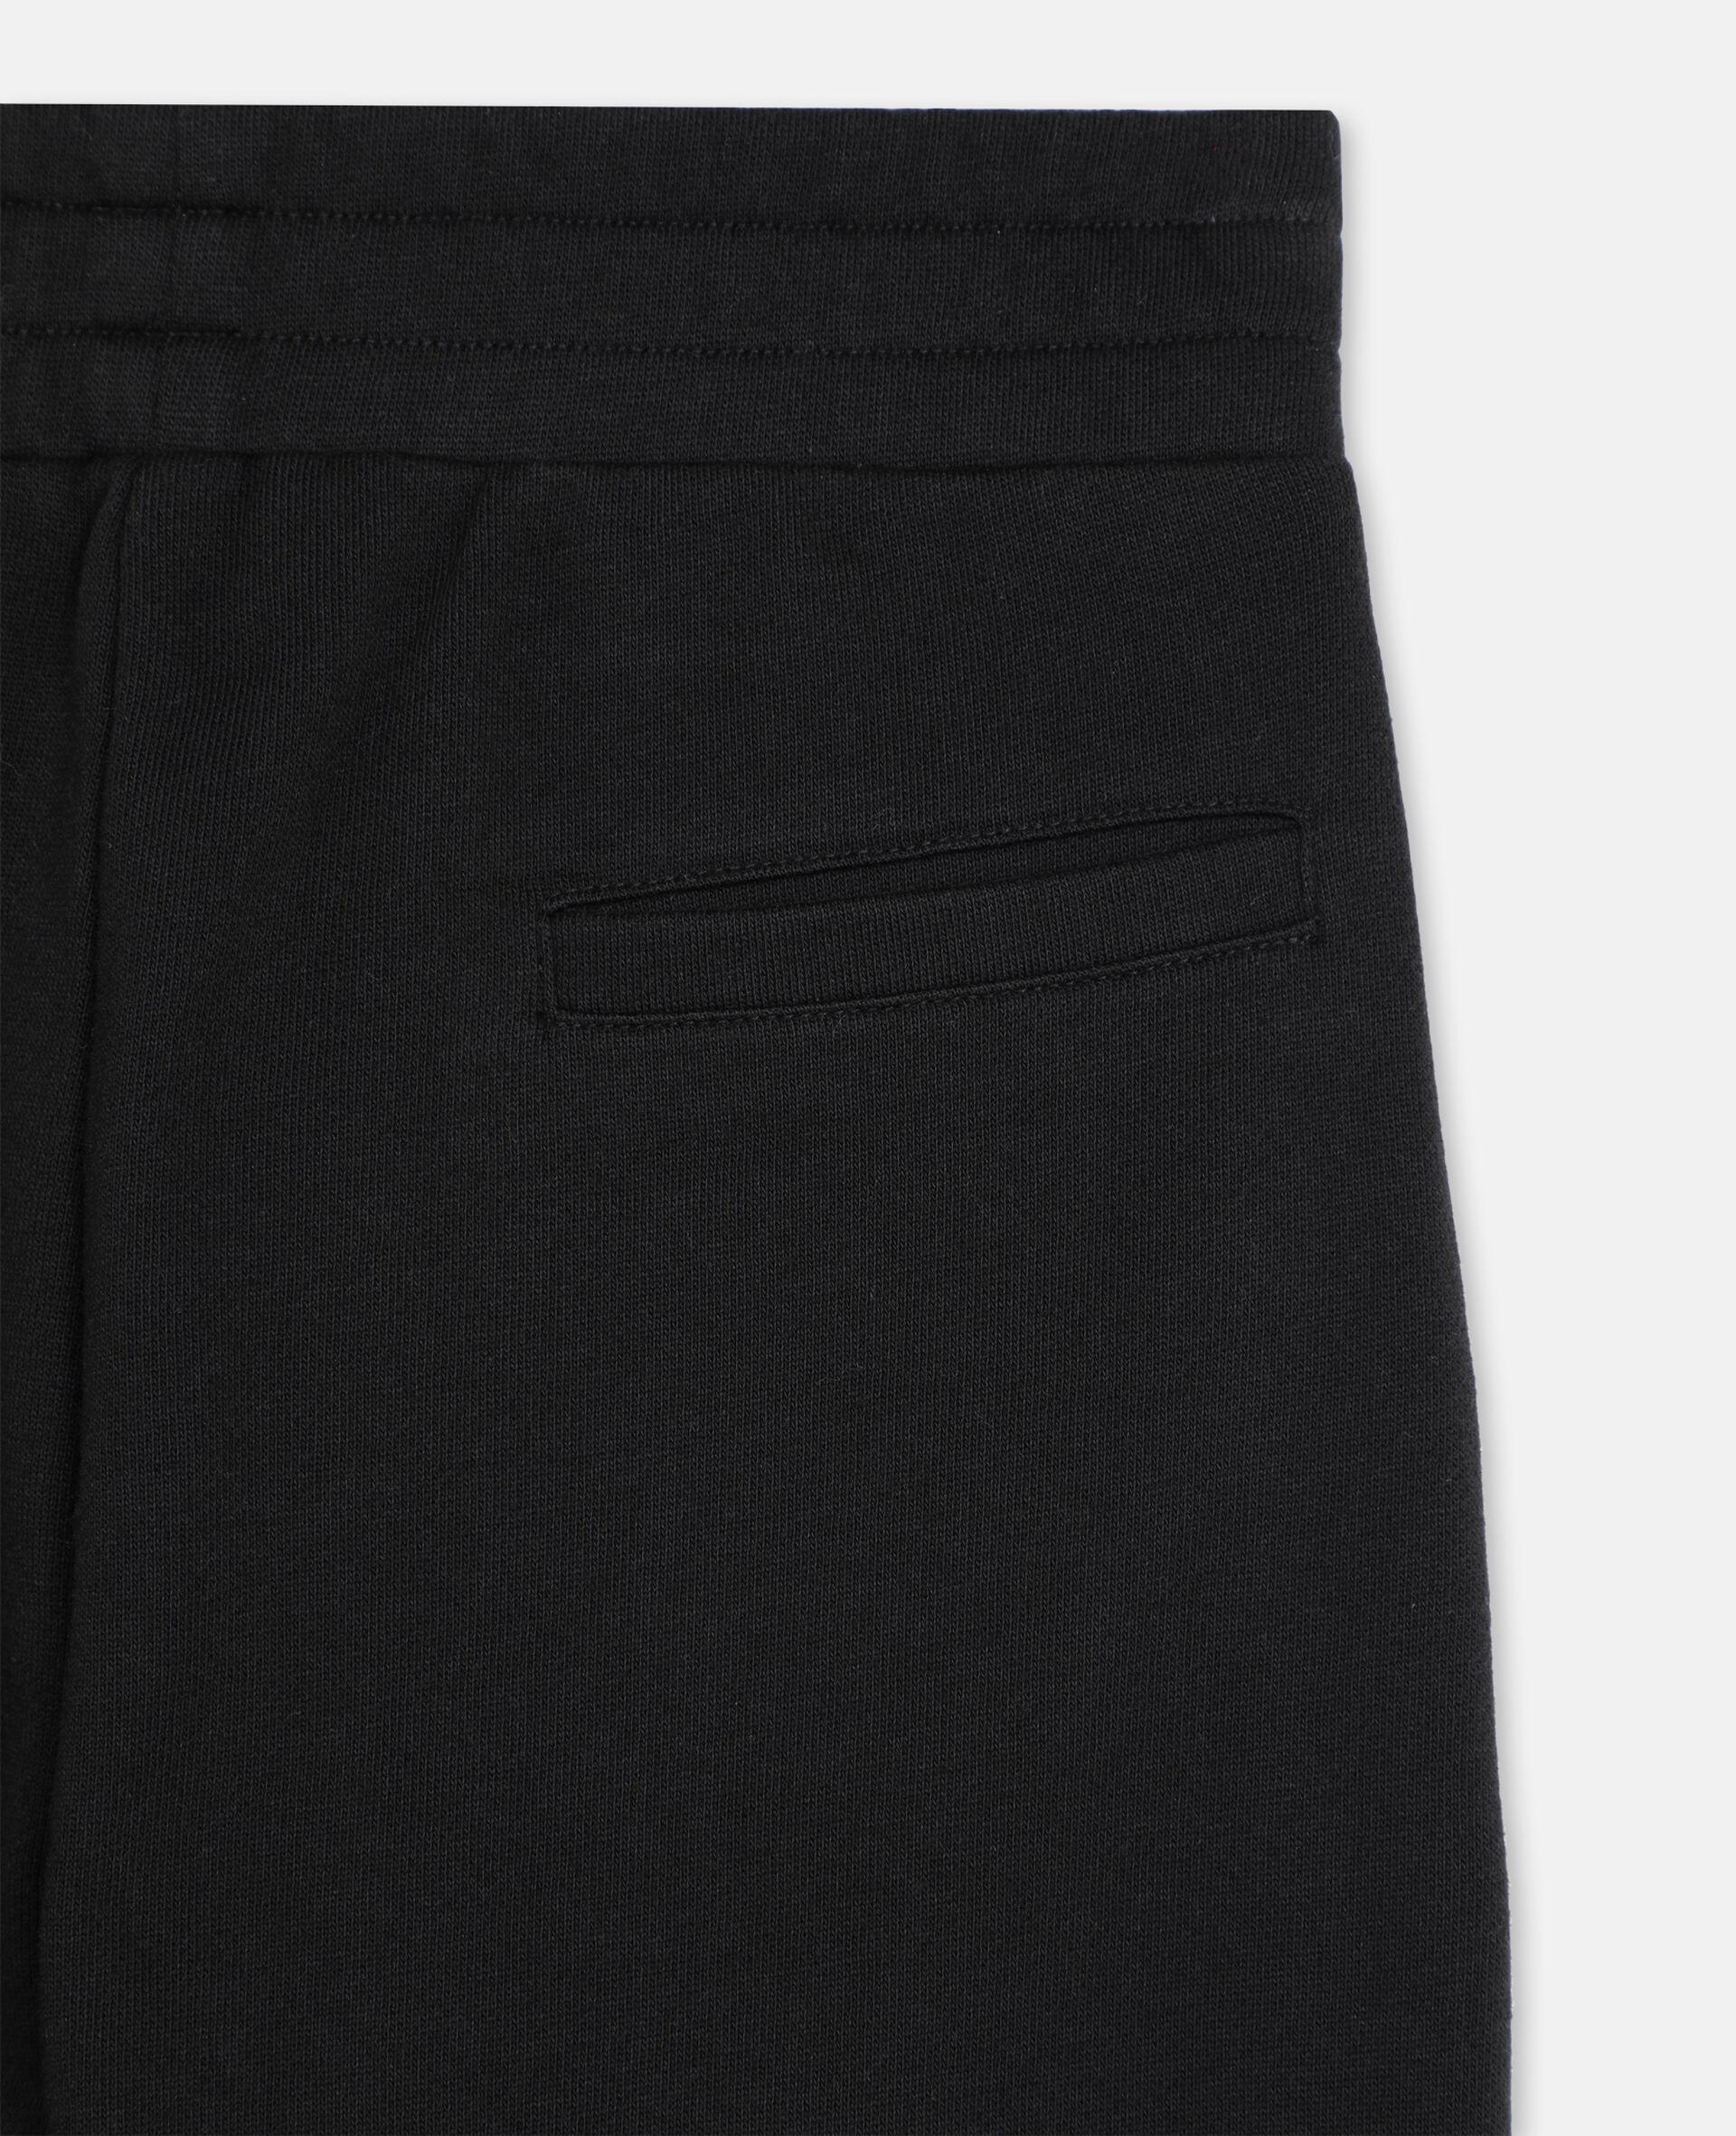 Basic Cotton Sweatpants -Black-large image number 2